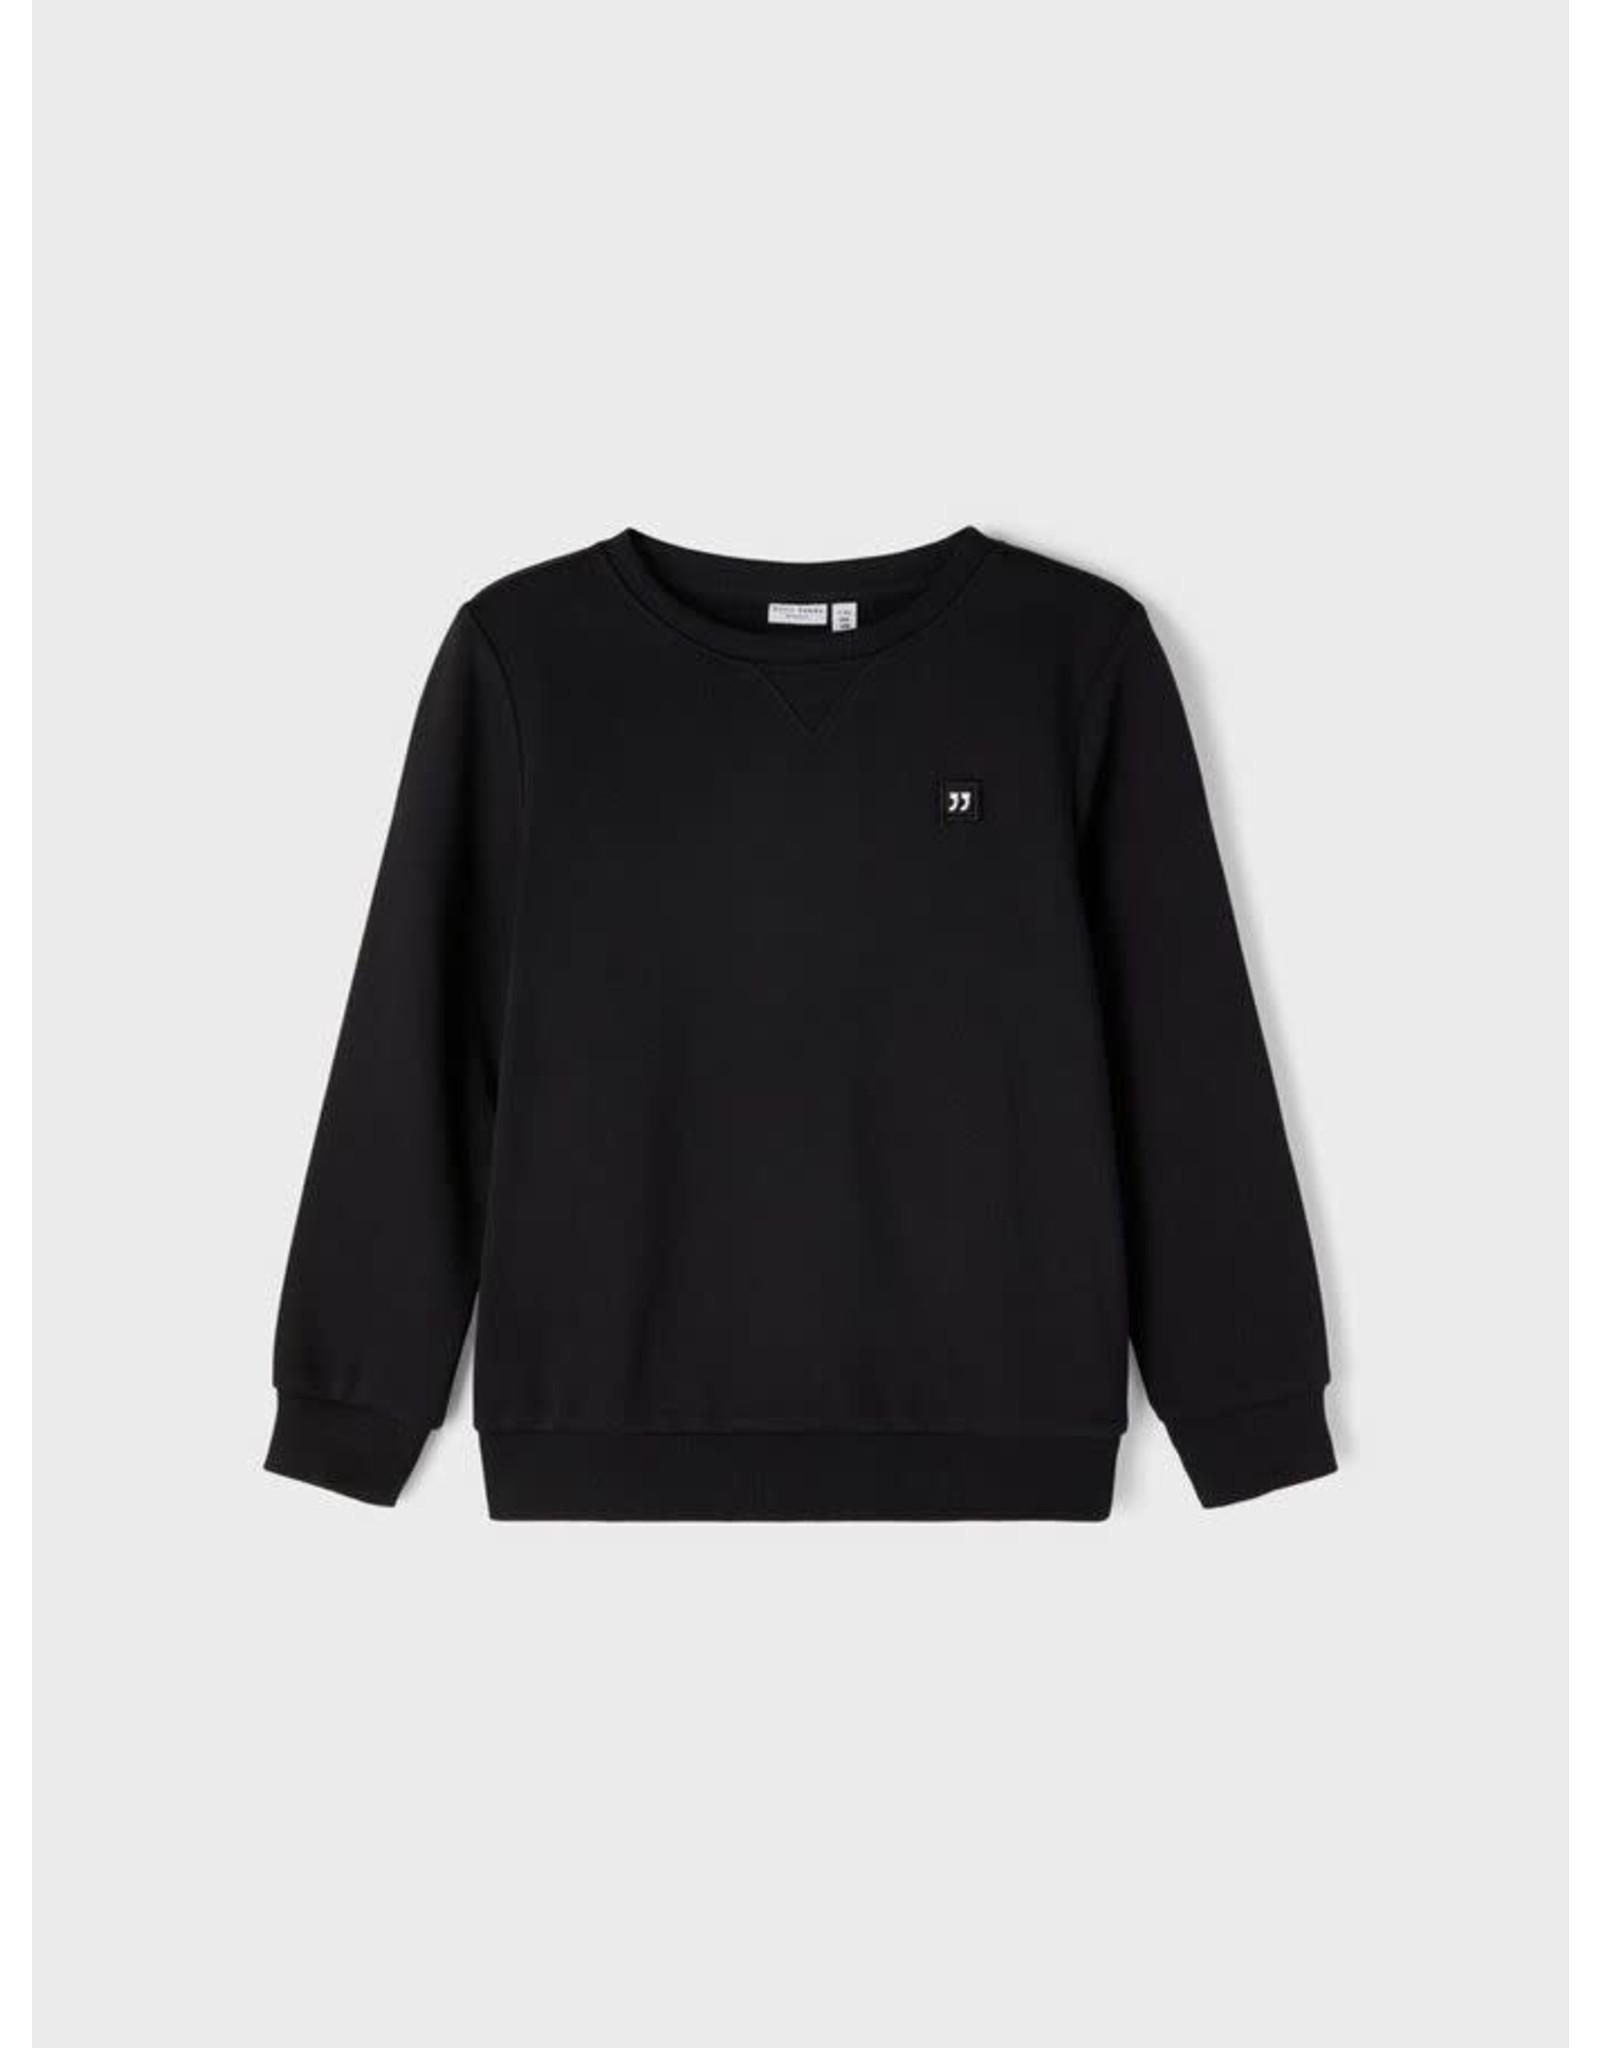 Name It Zwarte jogging trui